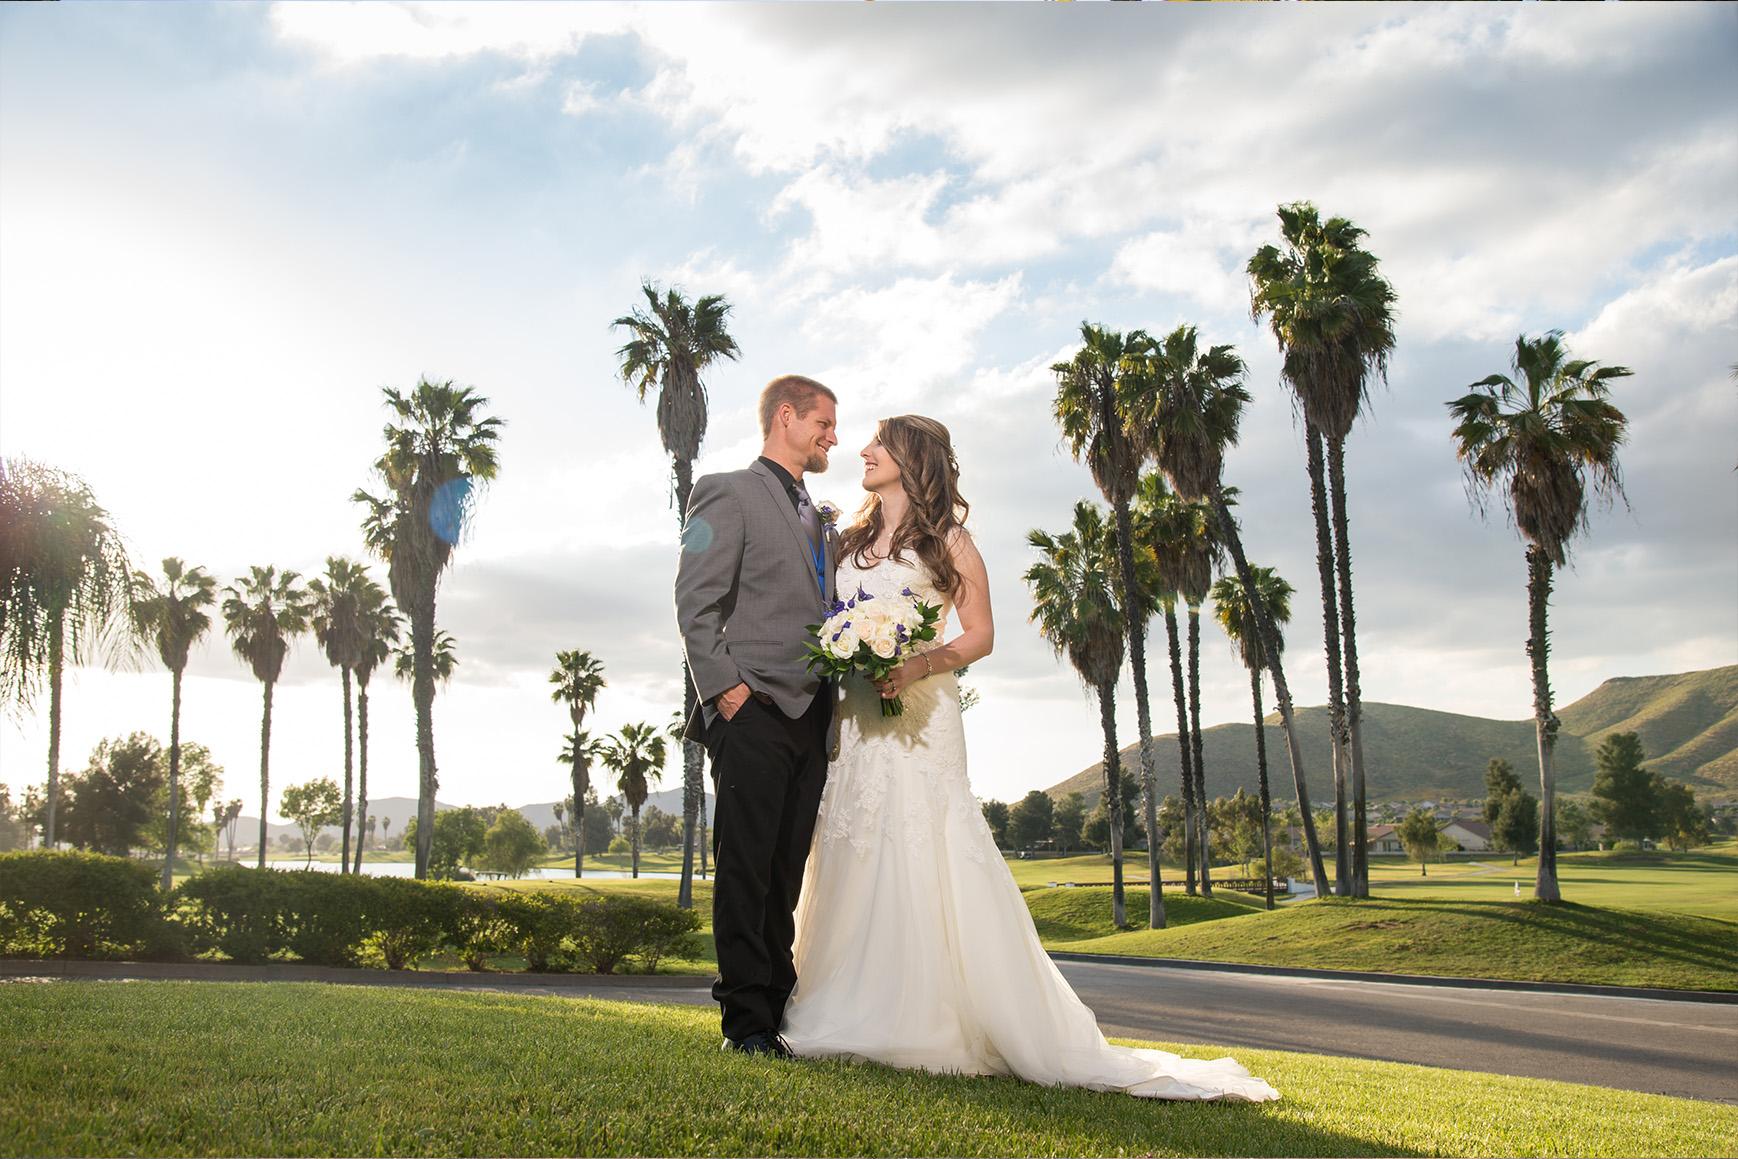 Views overlooking the rolling greens of the lush golf course - Menifee Lakes - Menifee, California - Riverside County - Wedgewood Weddings